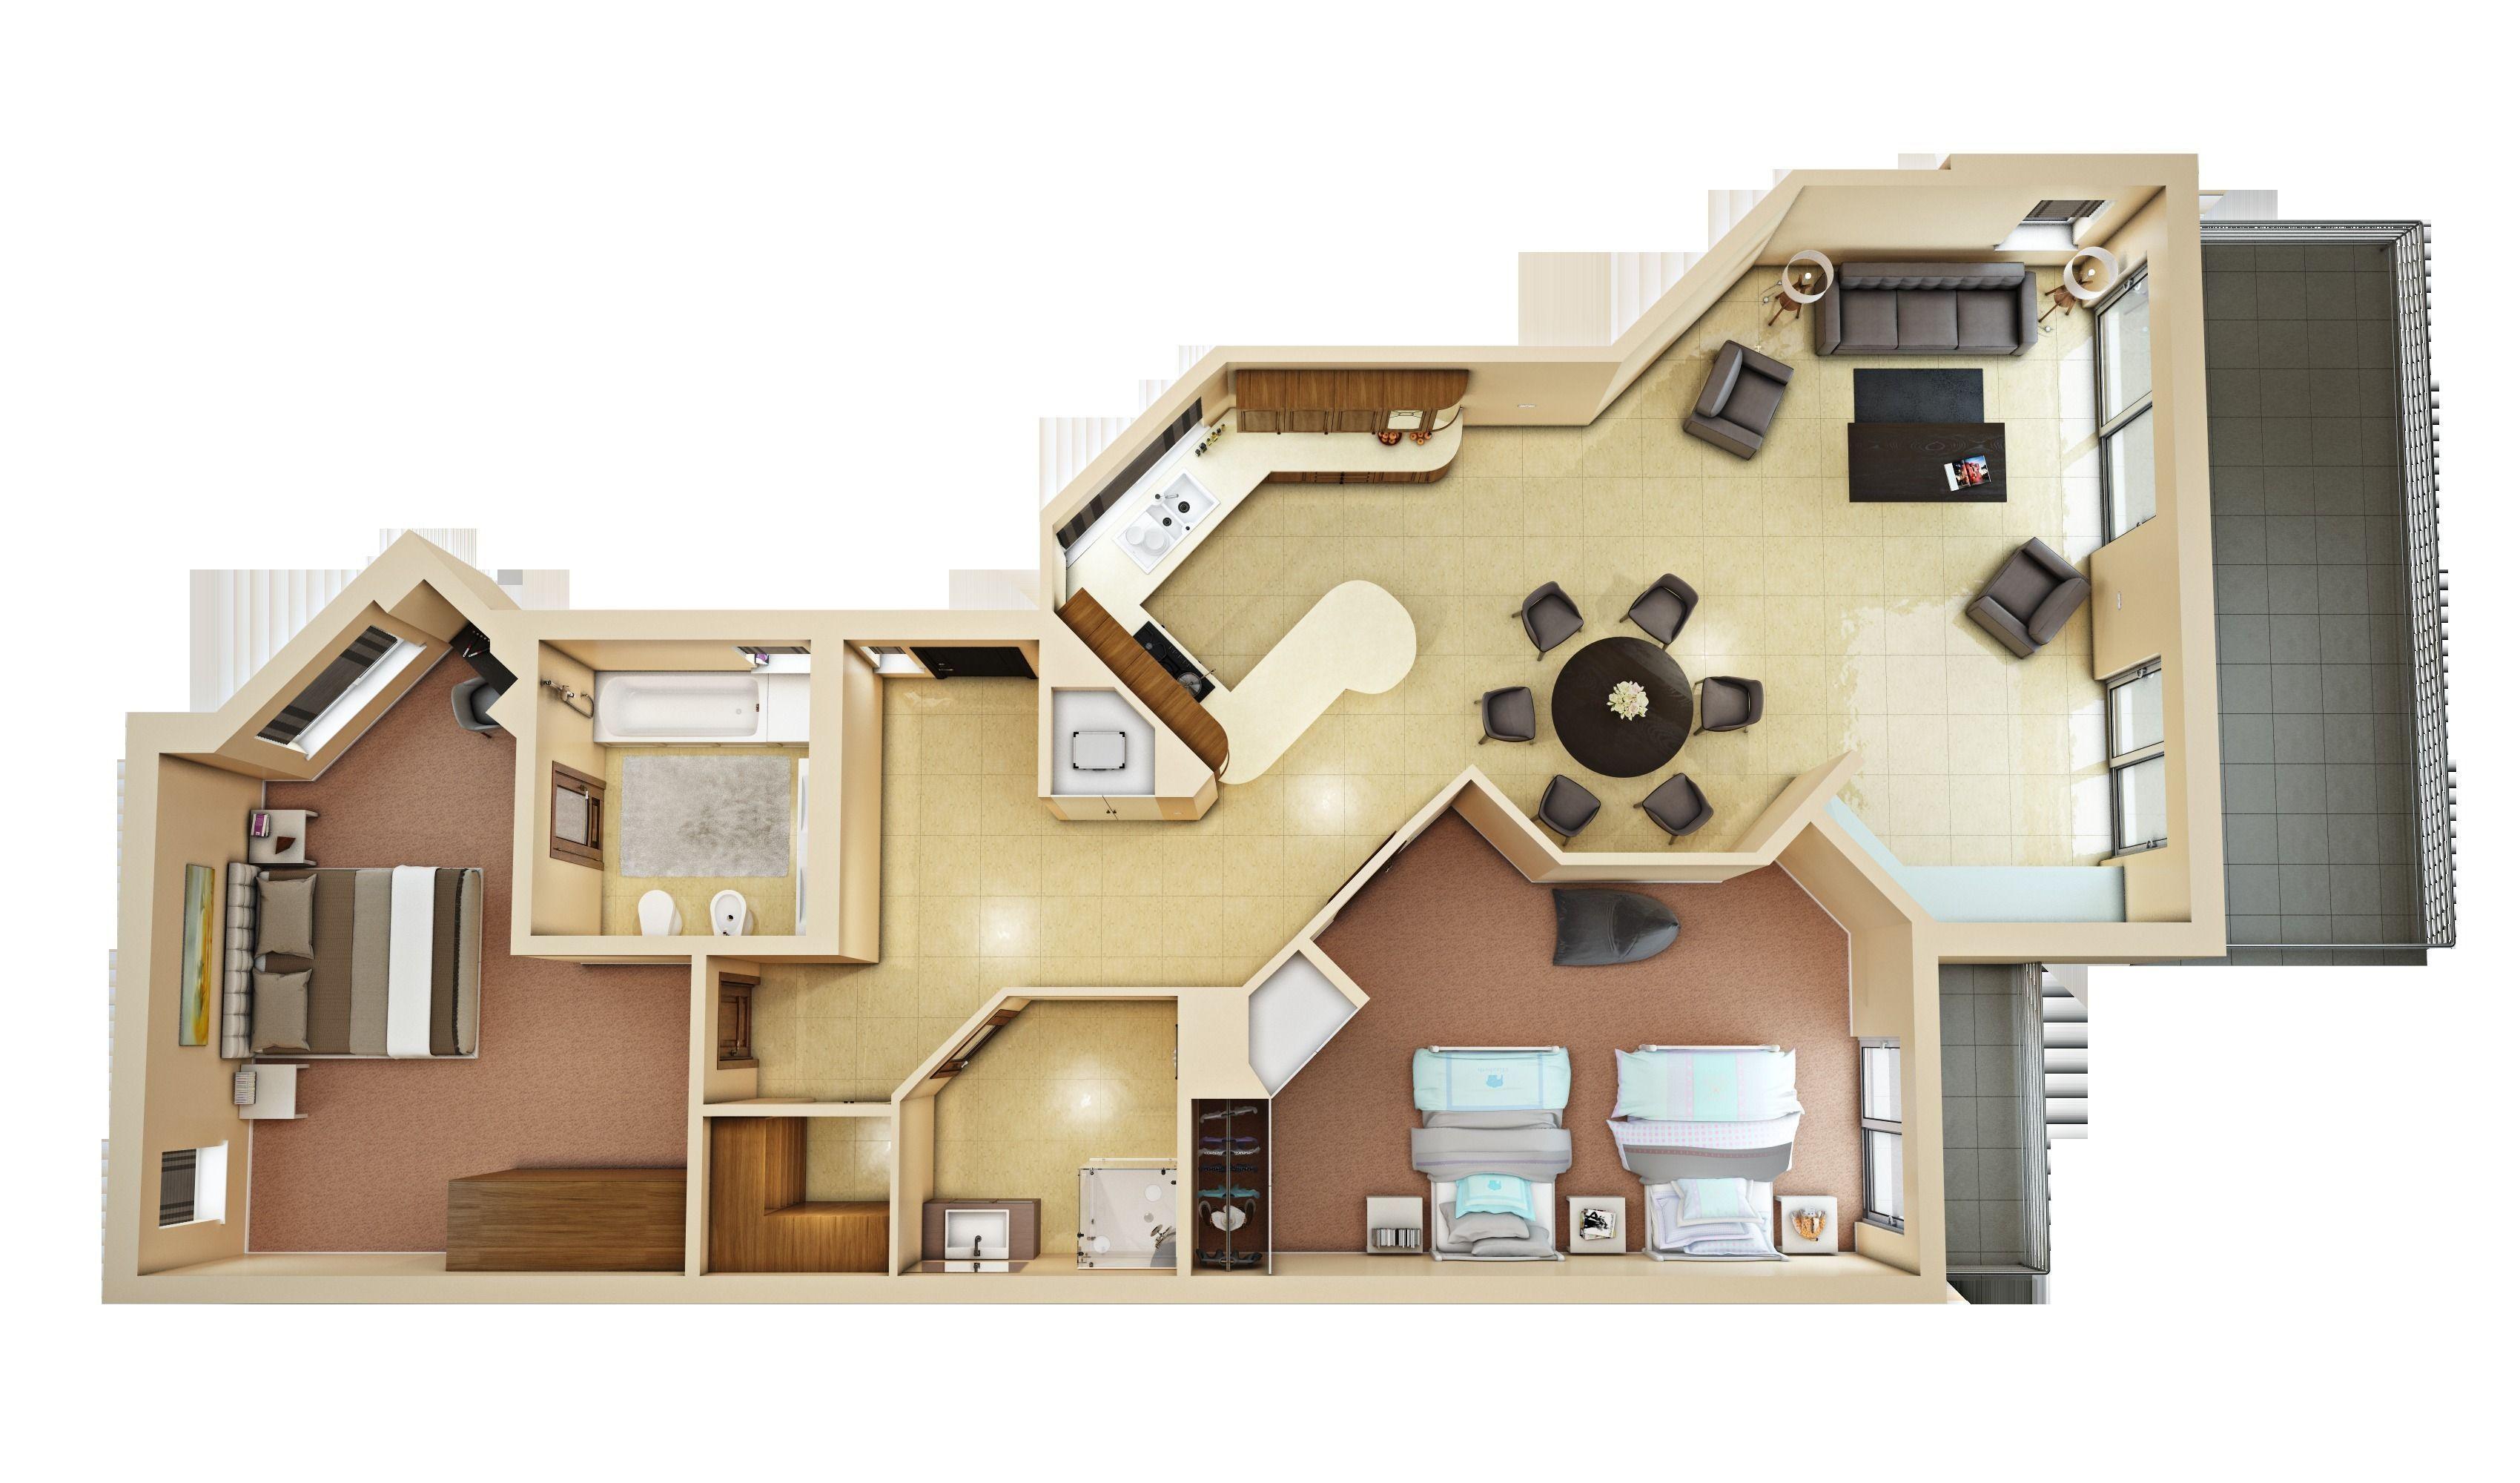 3d floor plan 4 | CGTrader